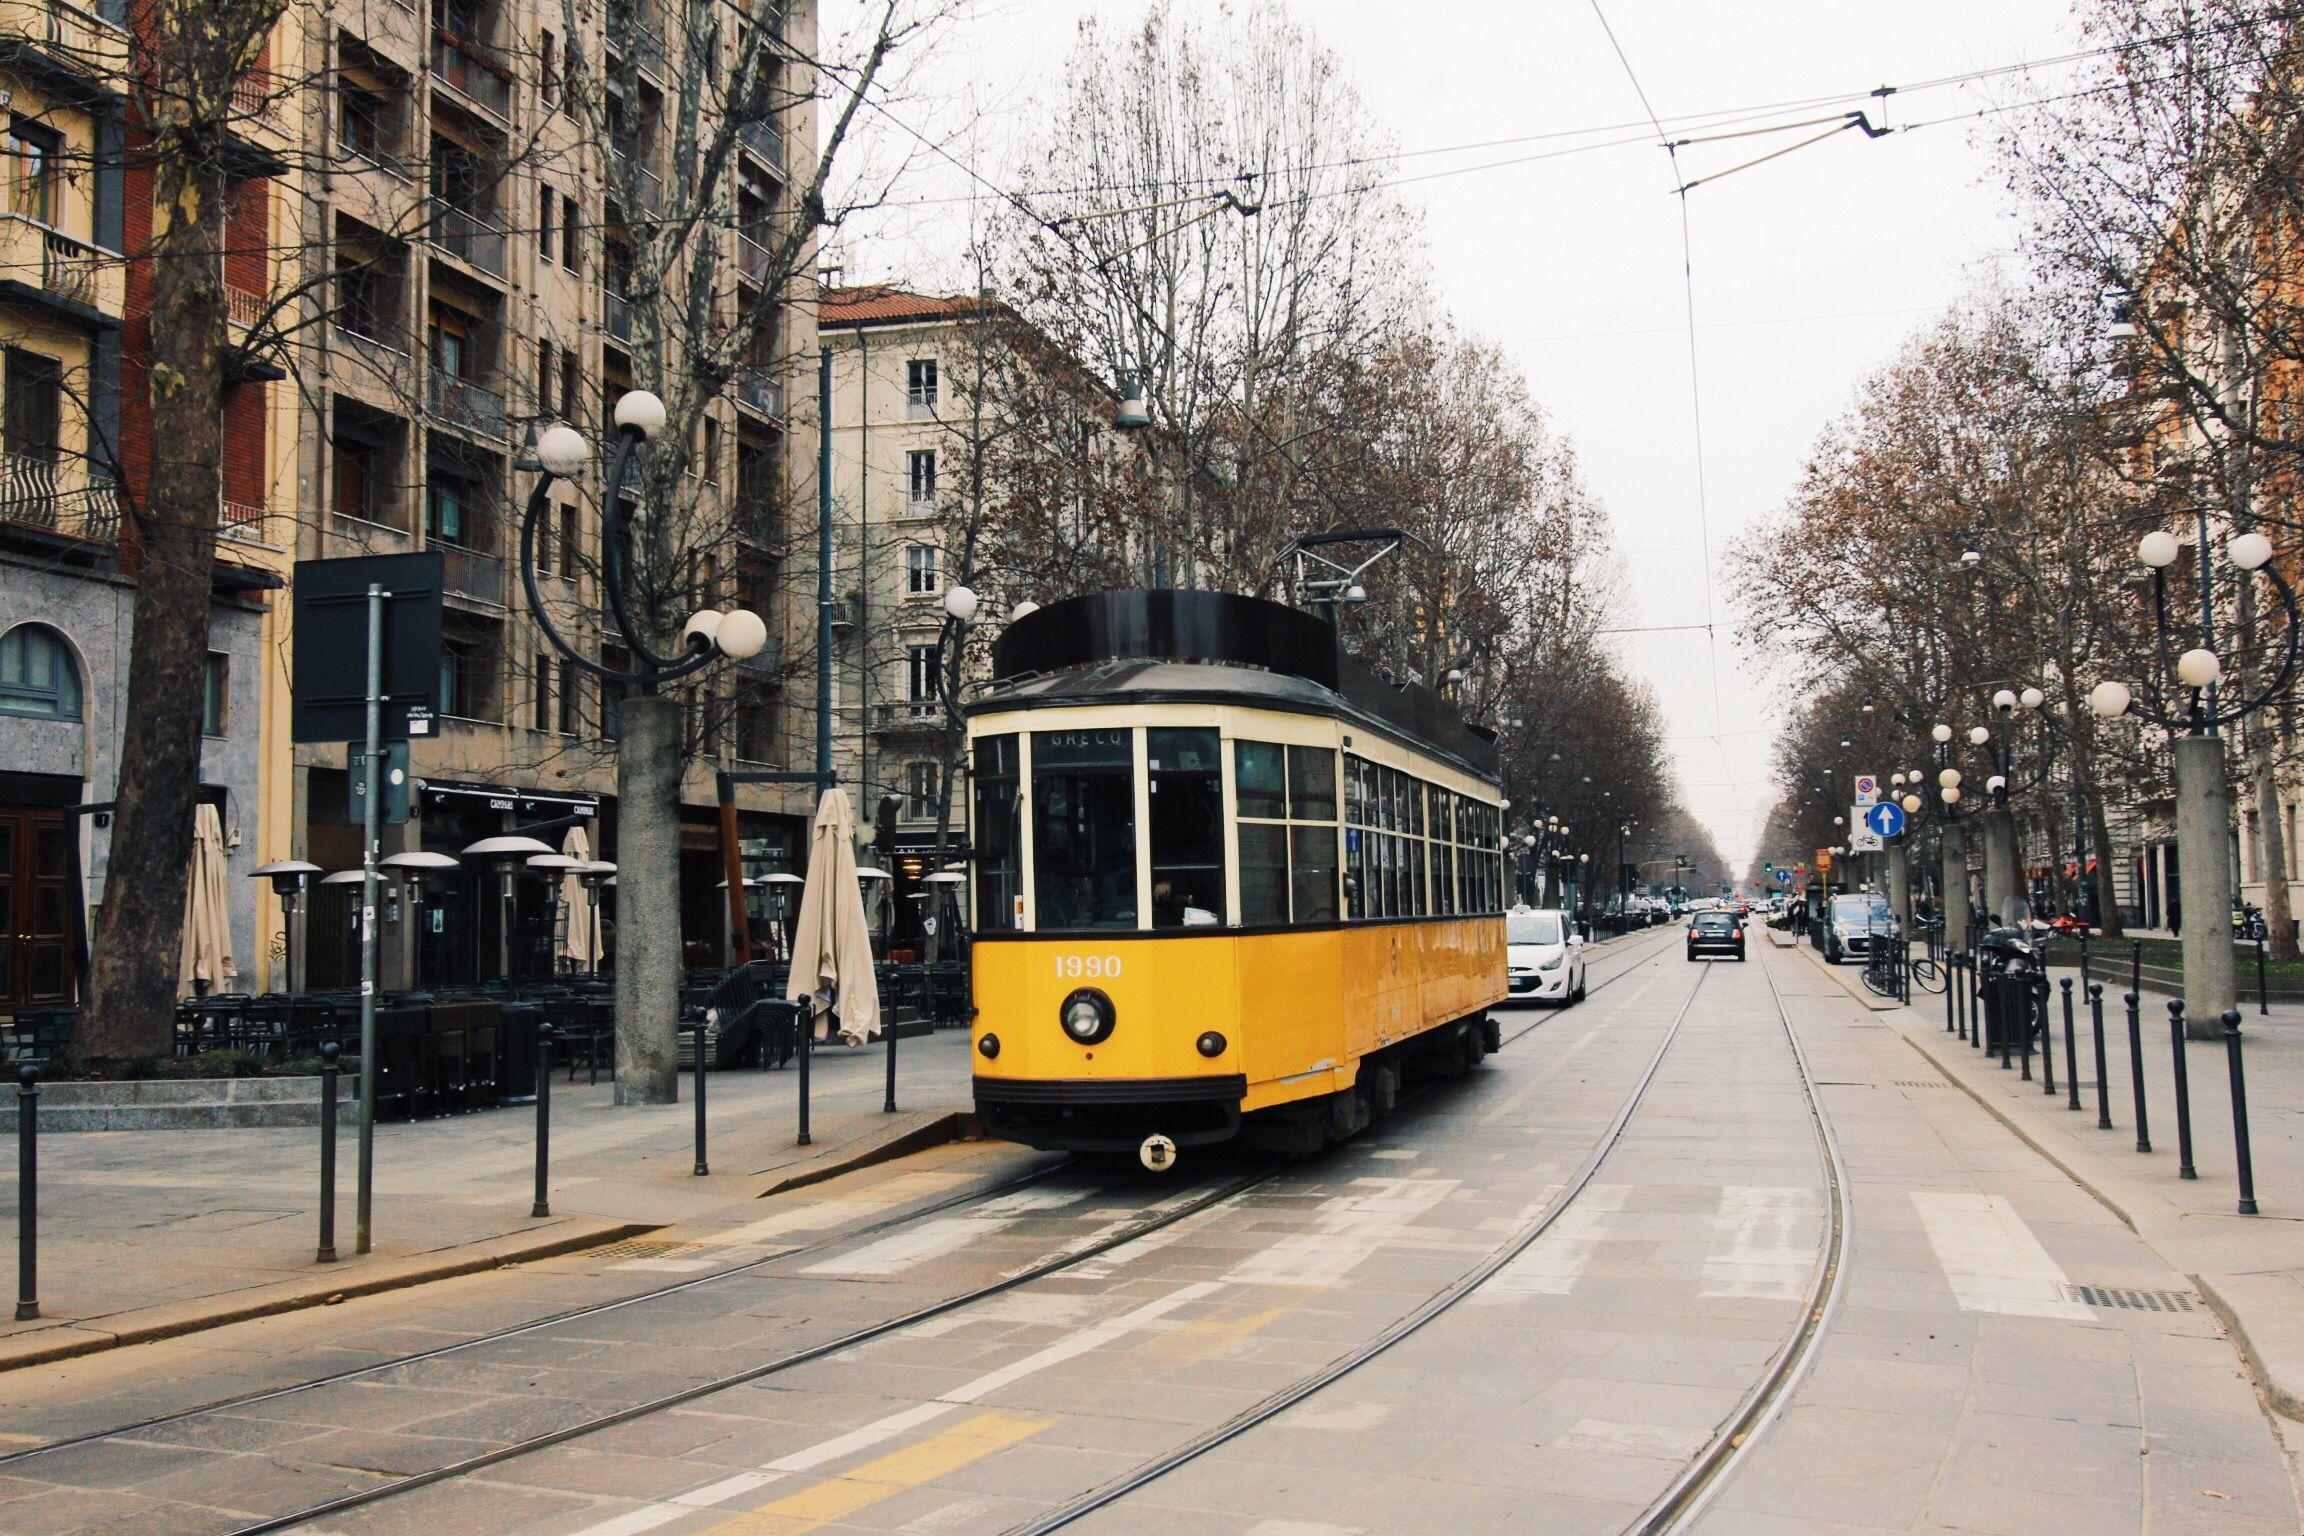 Milan, an amazing city. #photography